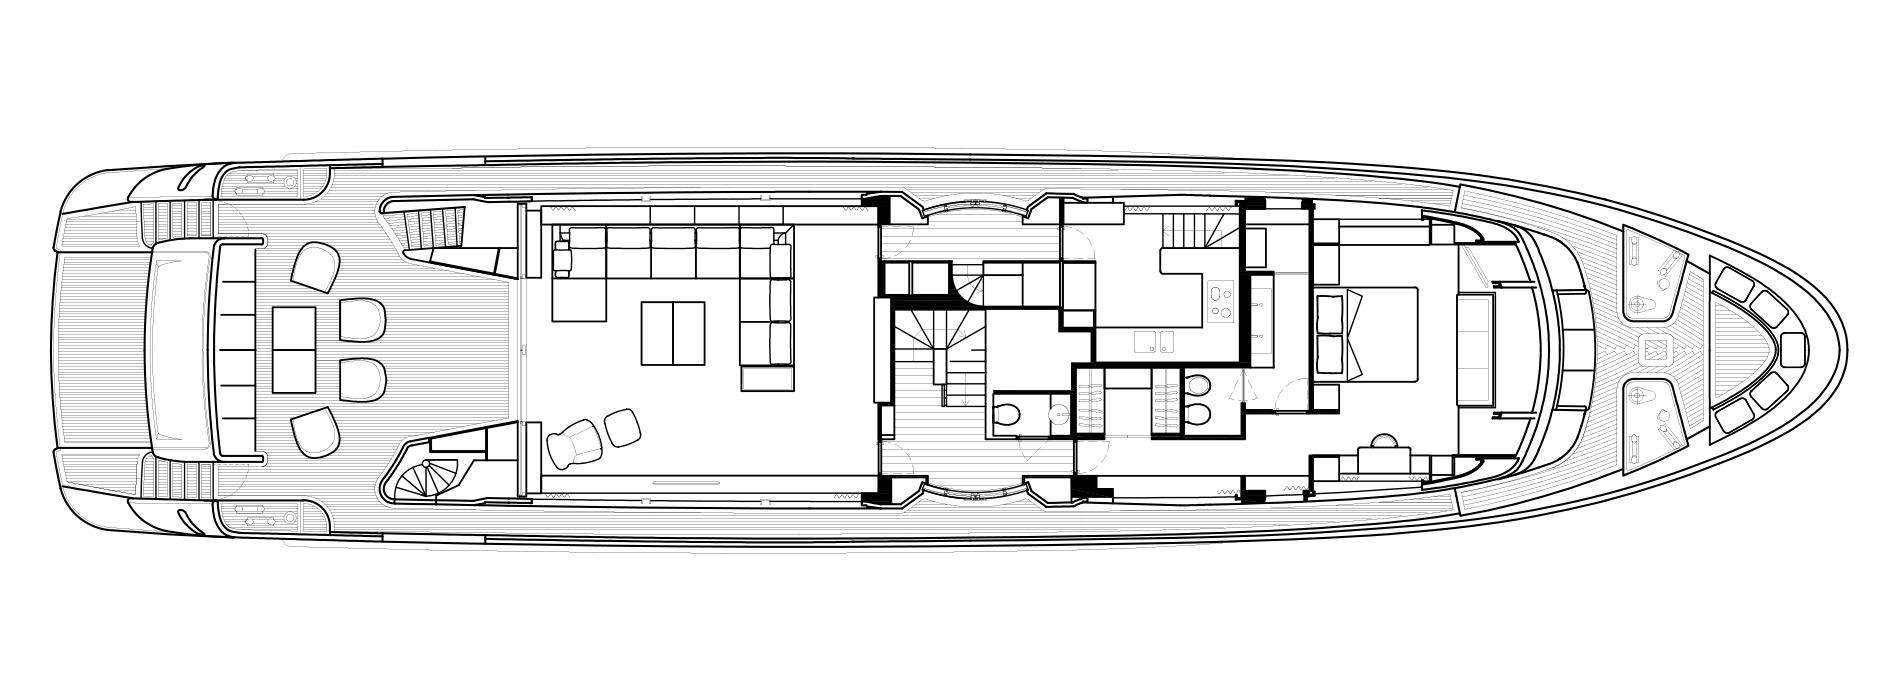 Sanlorenzo Yachts SD112 主甲板 Versione B